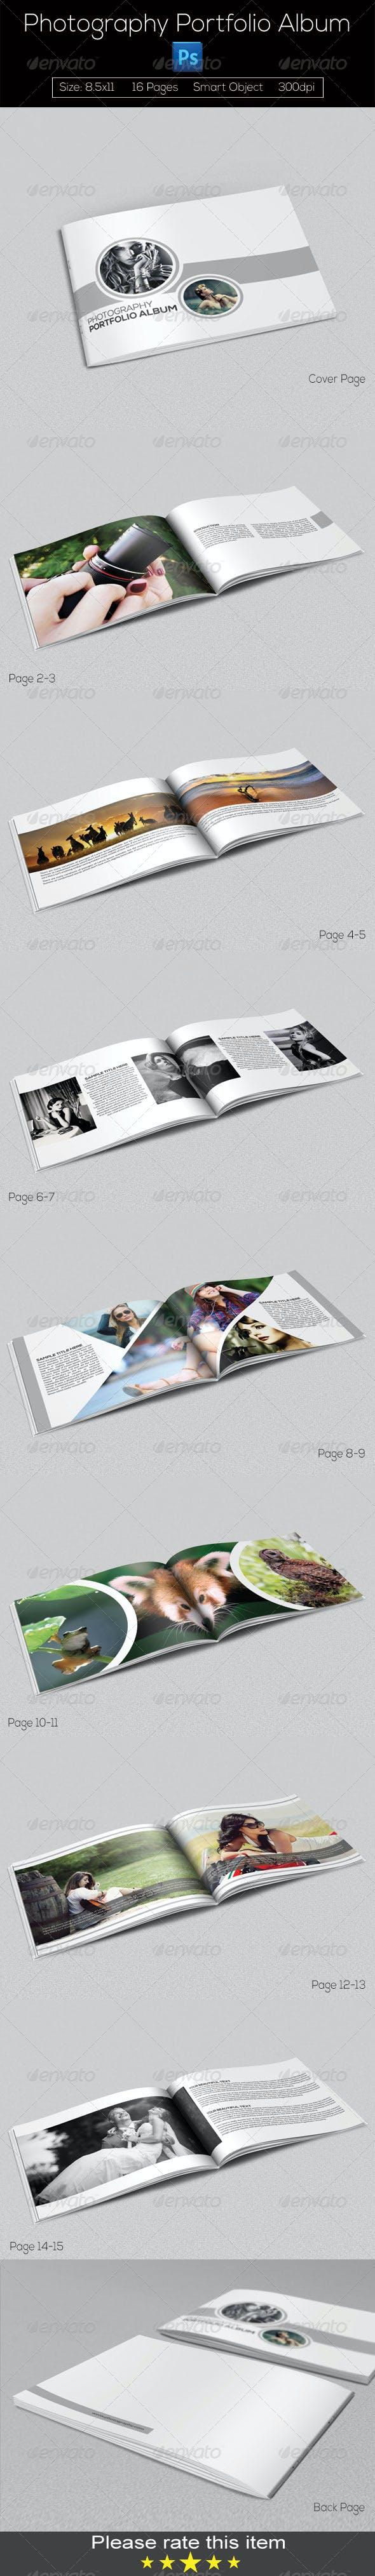 Photography Portfolio Album